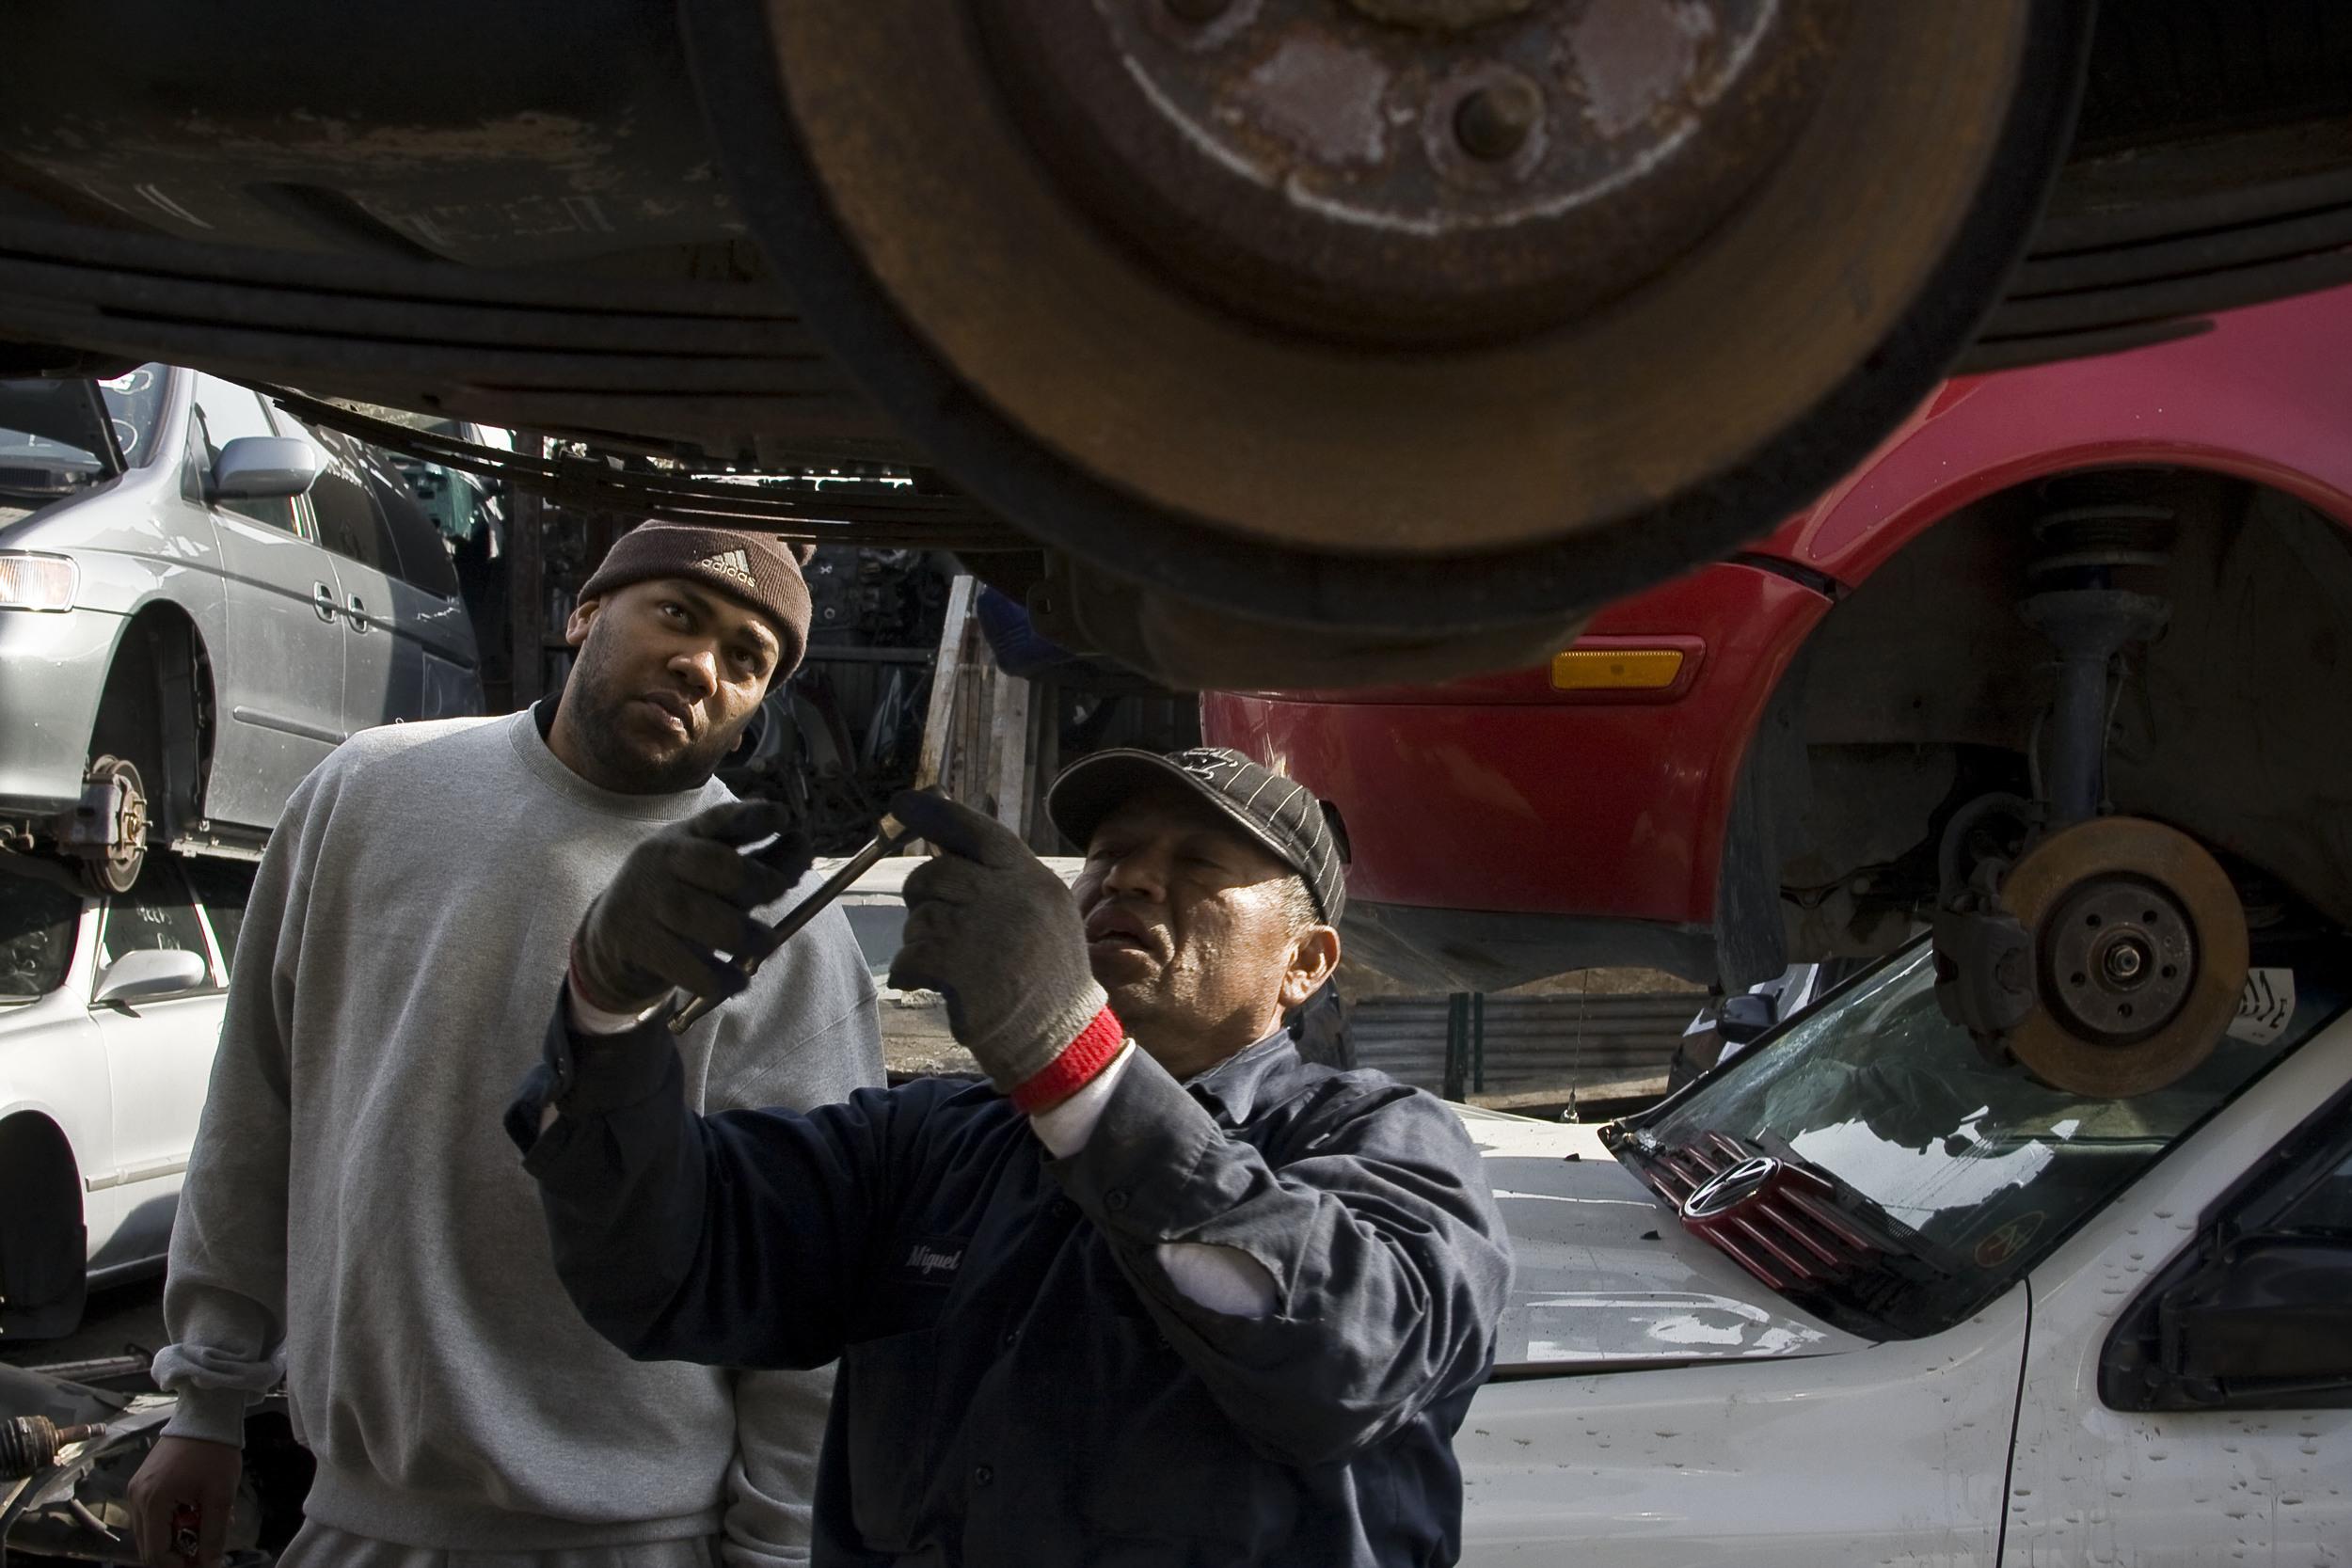 Auto body workers. David Auto Wreckers, 2011.